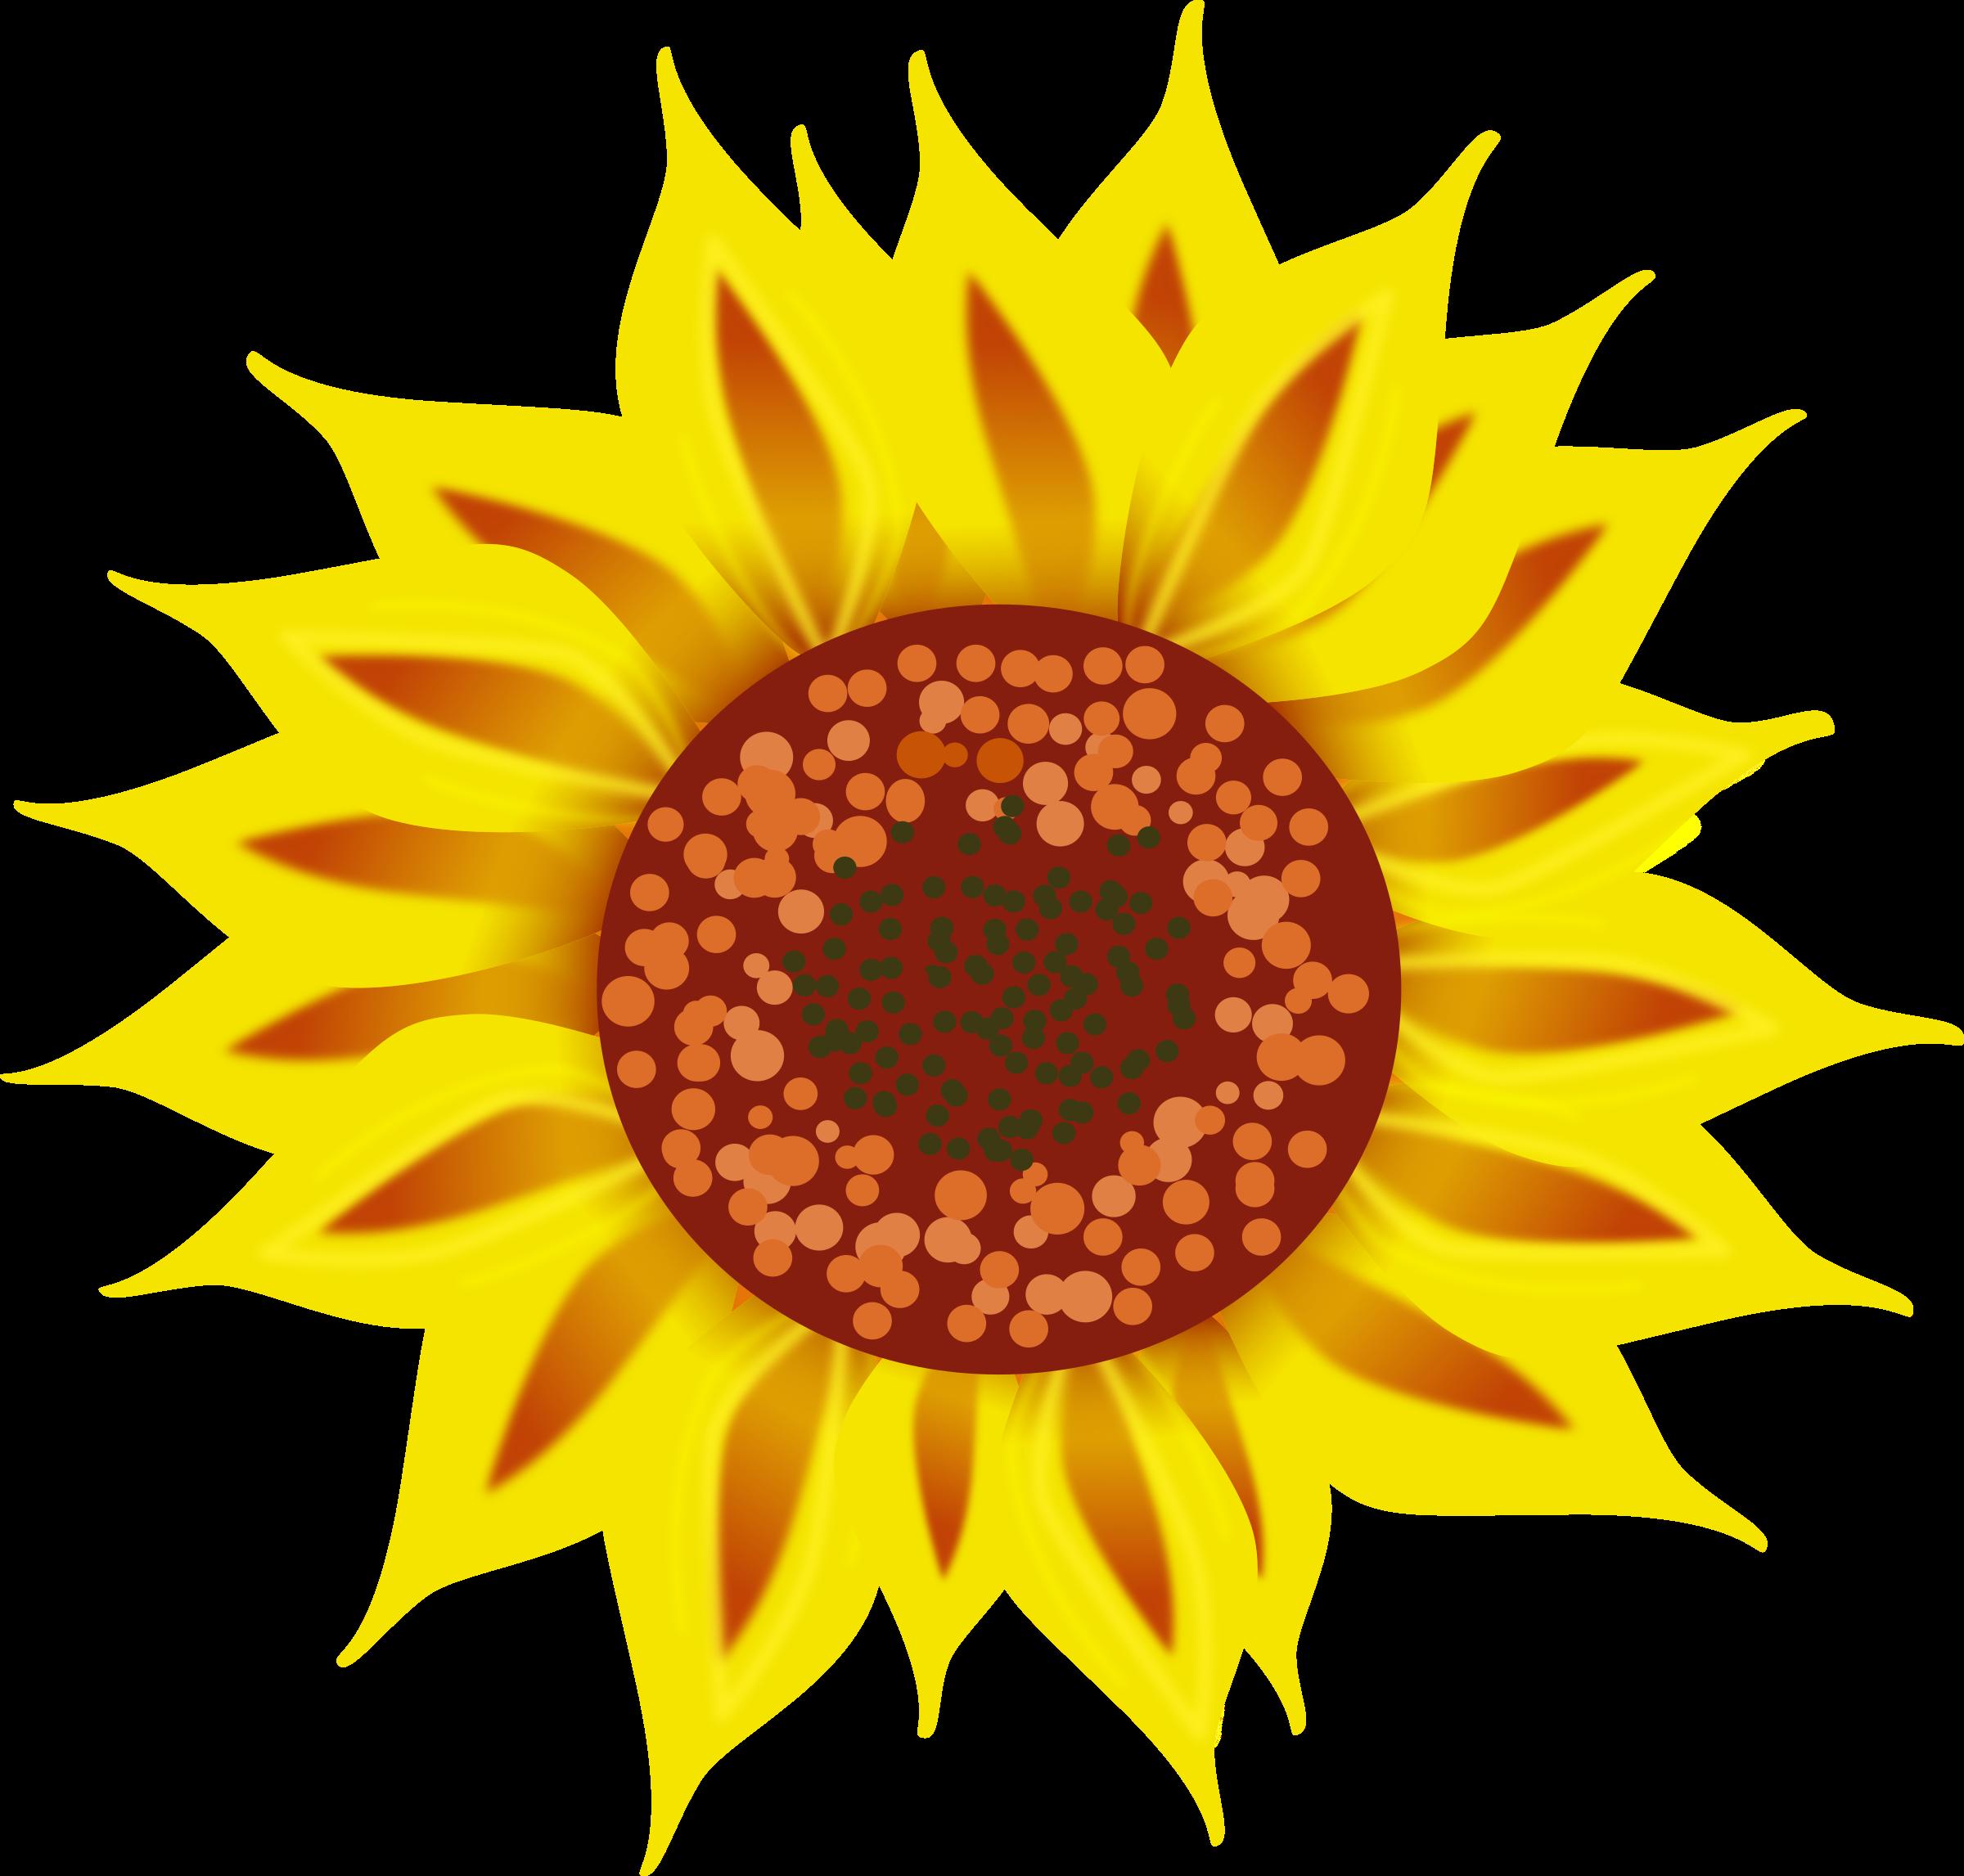 Clipart sun flower vector black and white library Clipart - Sunflower vector black and white library